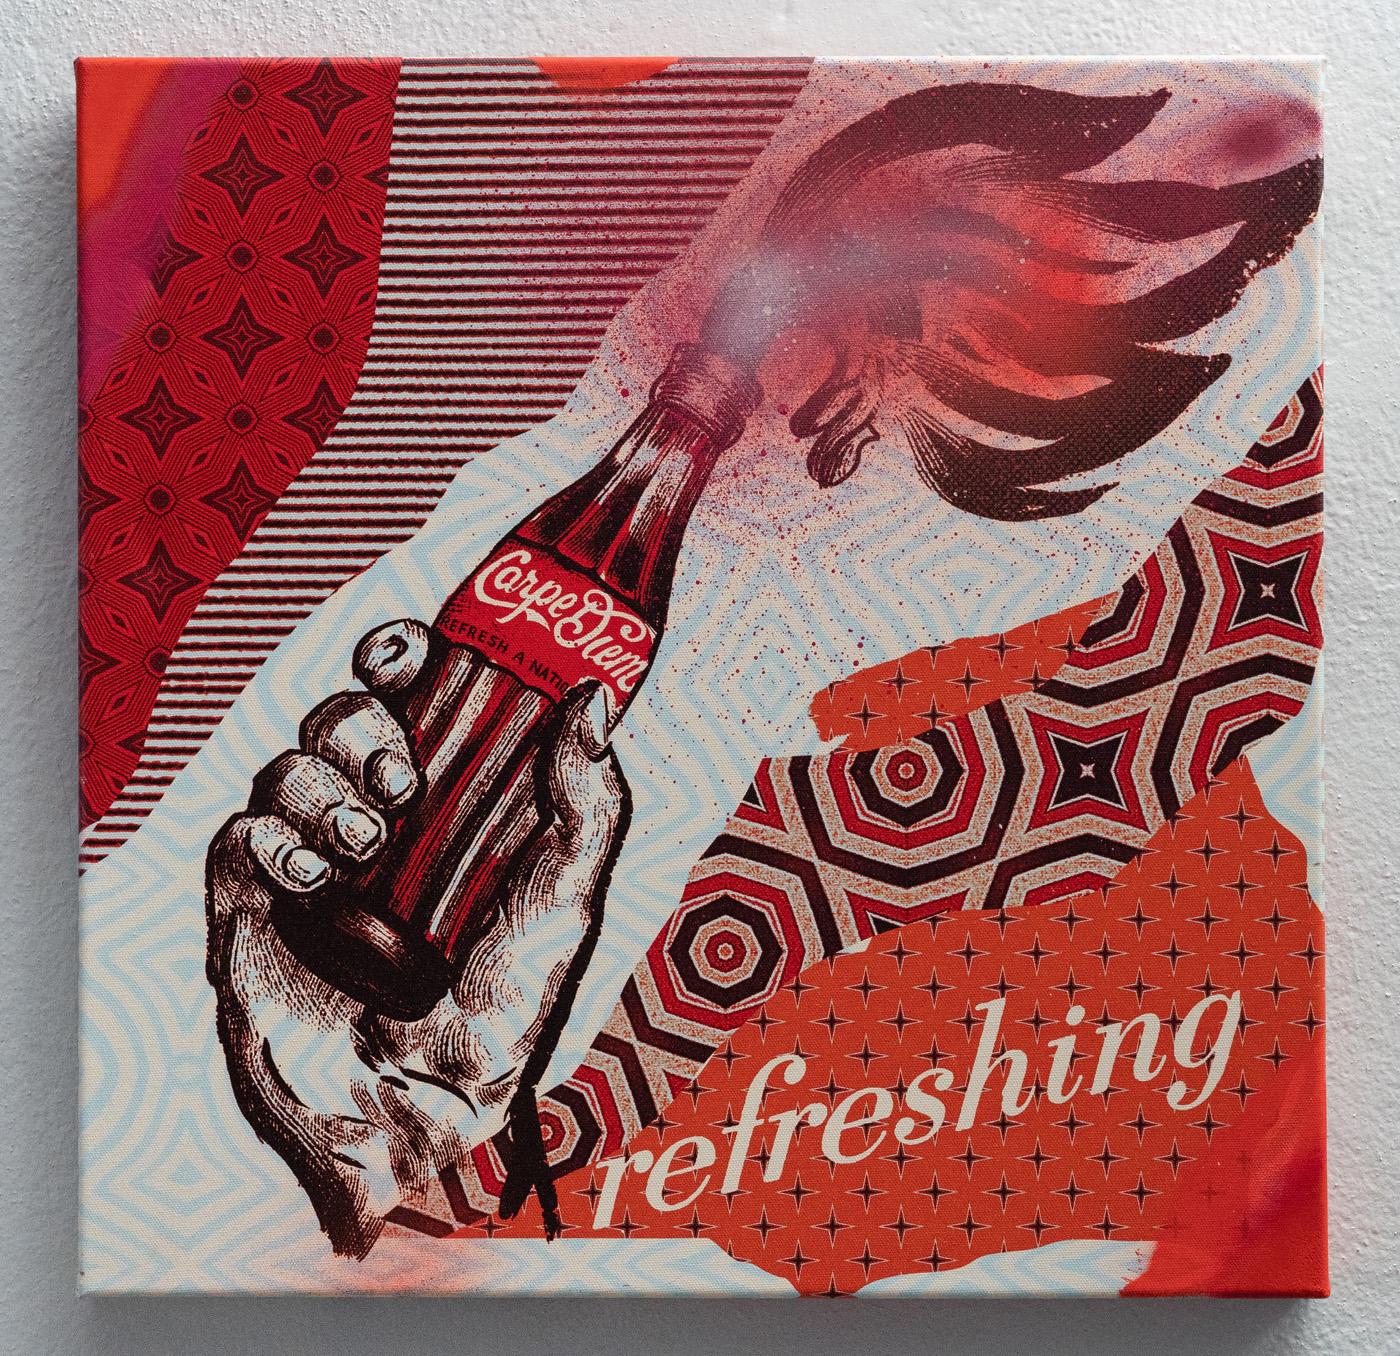 REFRESHING - 1.jpg